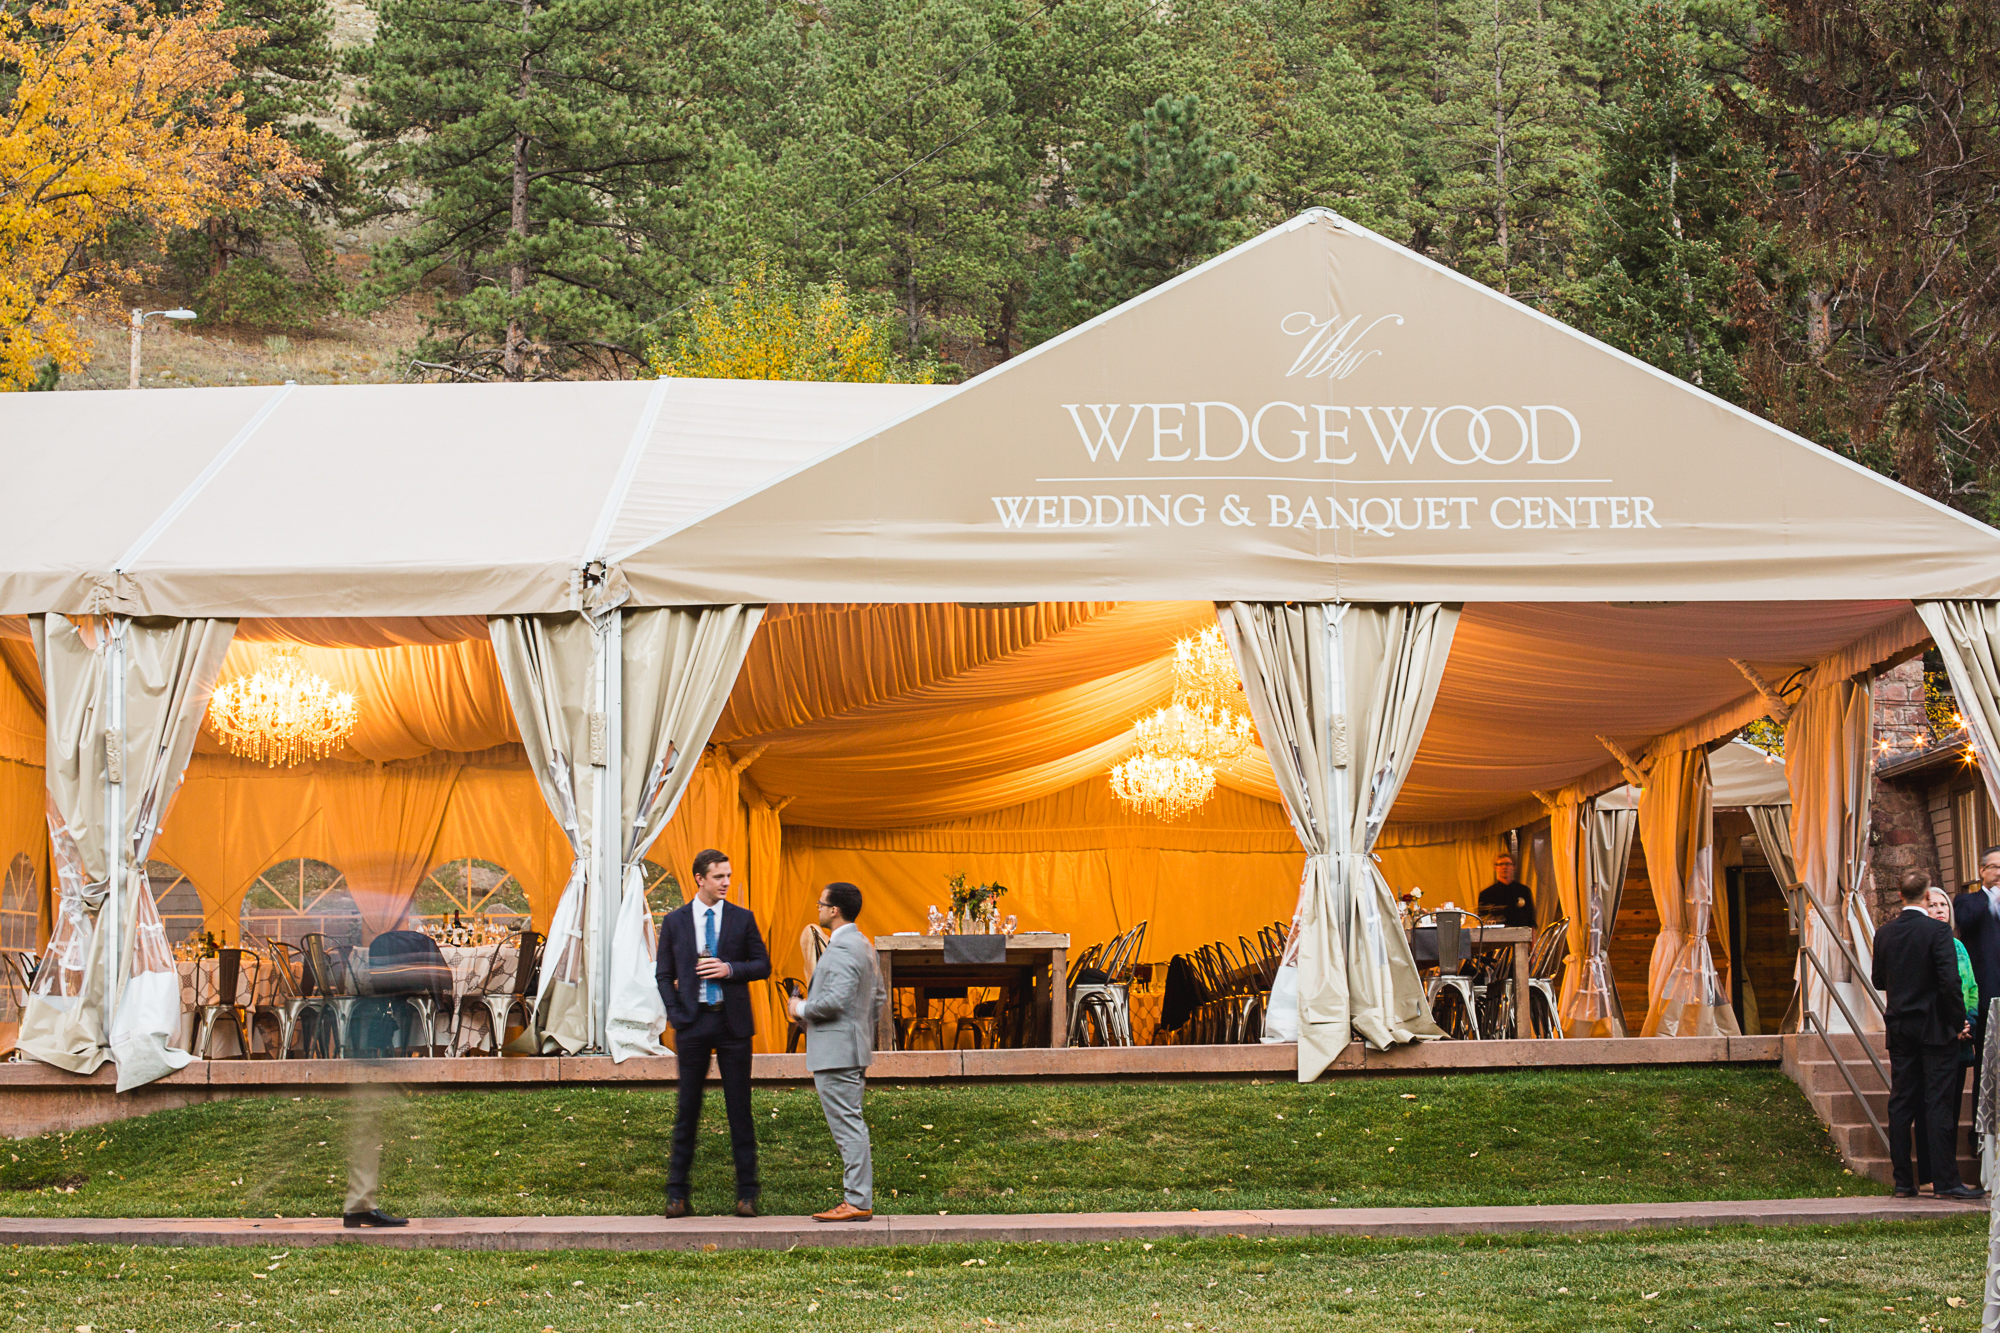 ckiffney-Boulder_Wedgewood-0105.jpg